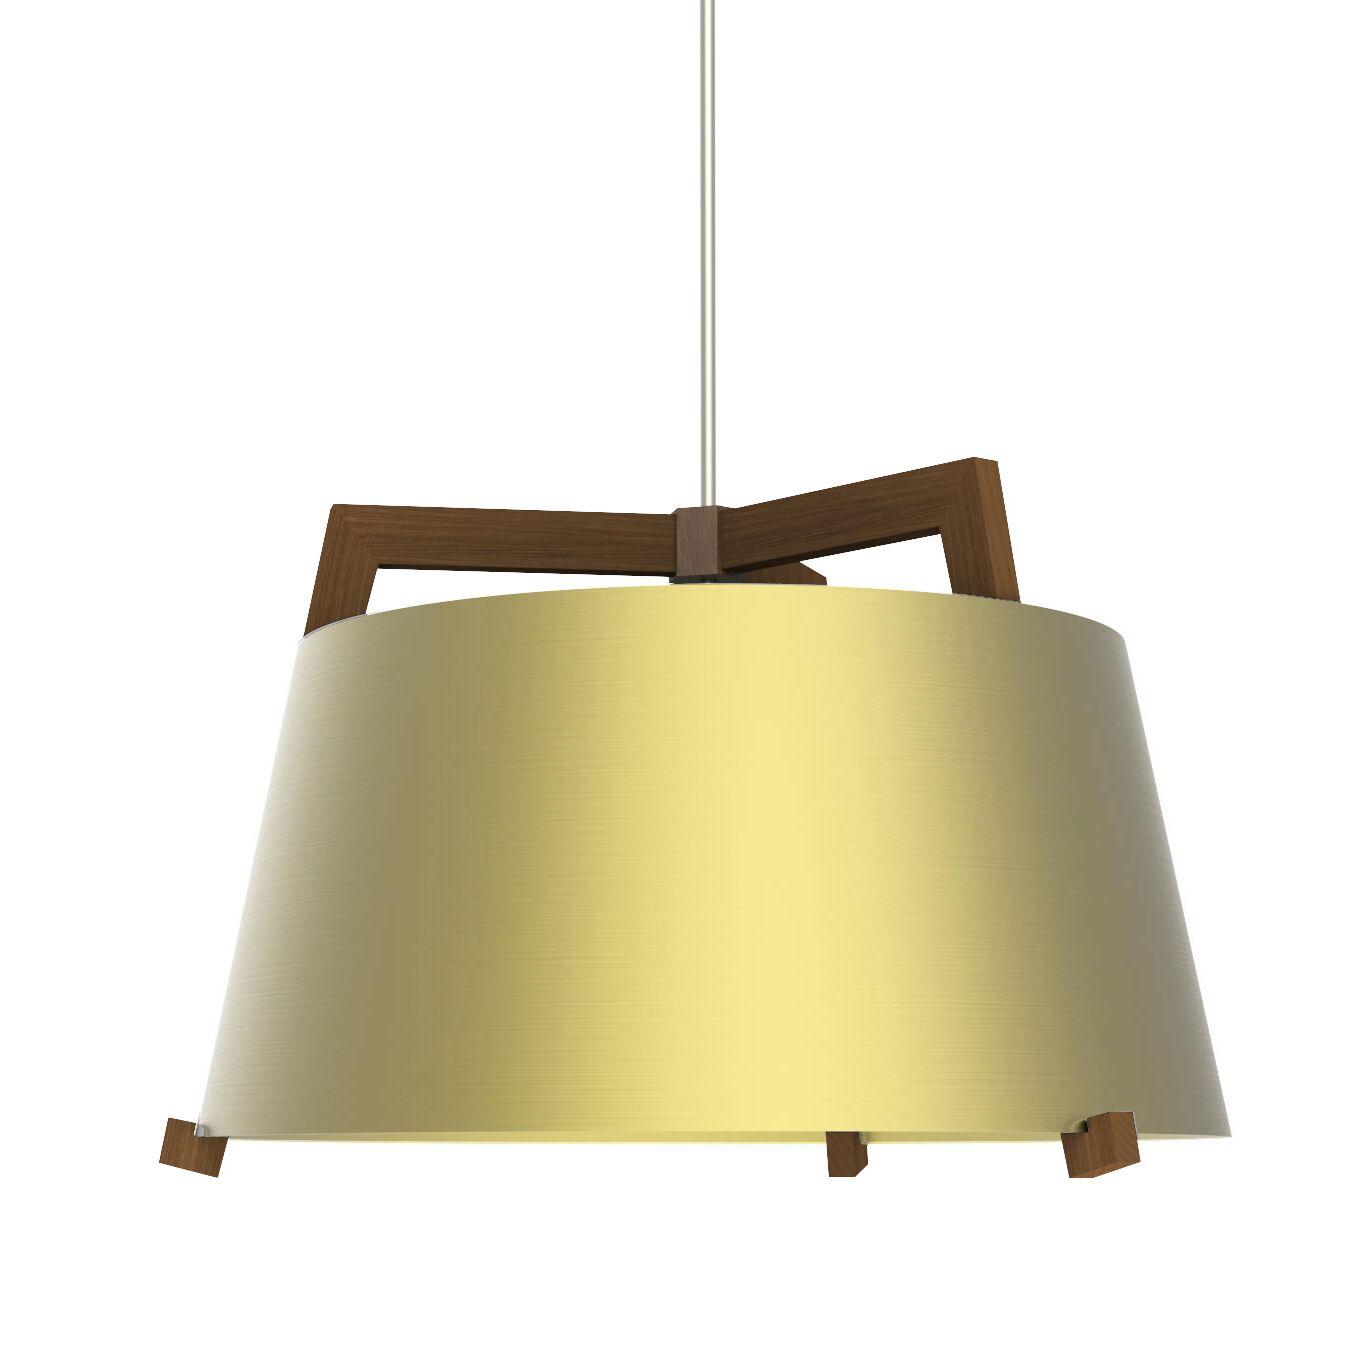 Ignis 1-Light Inverted Pendant Finish: Oiled Walnut/Brushed Brass